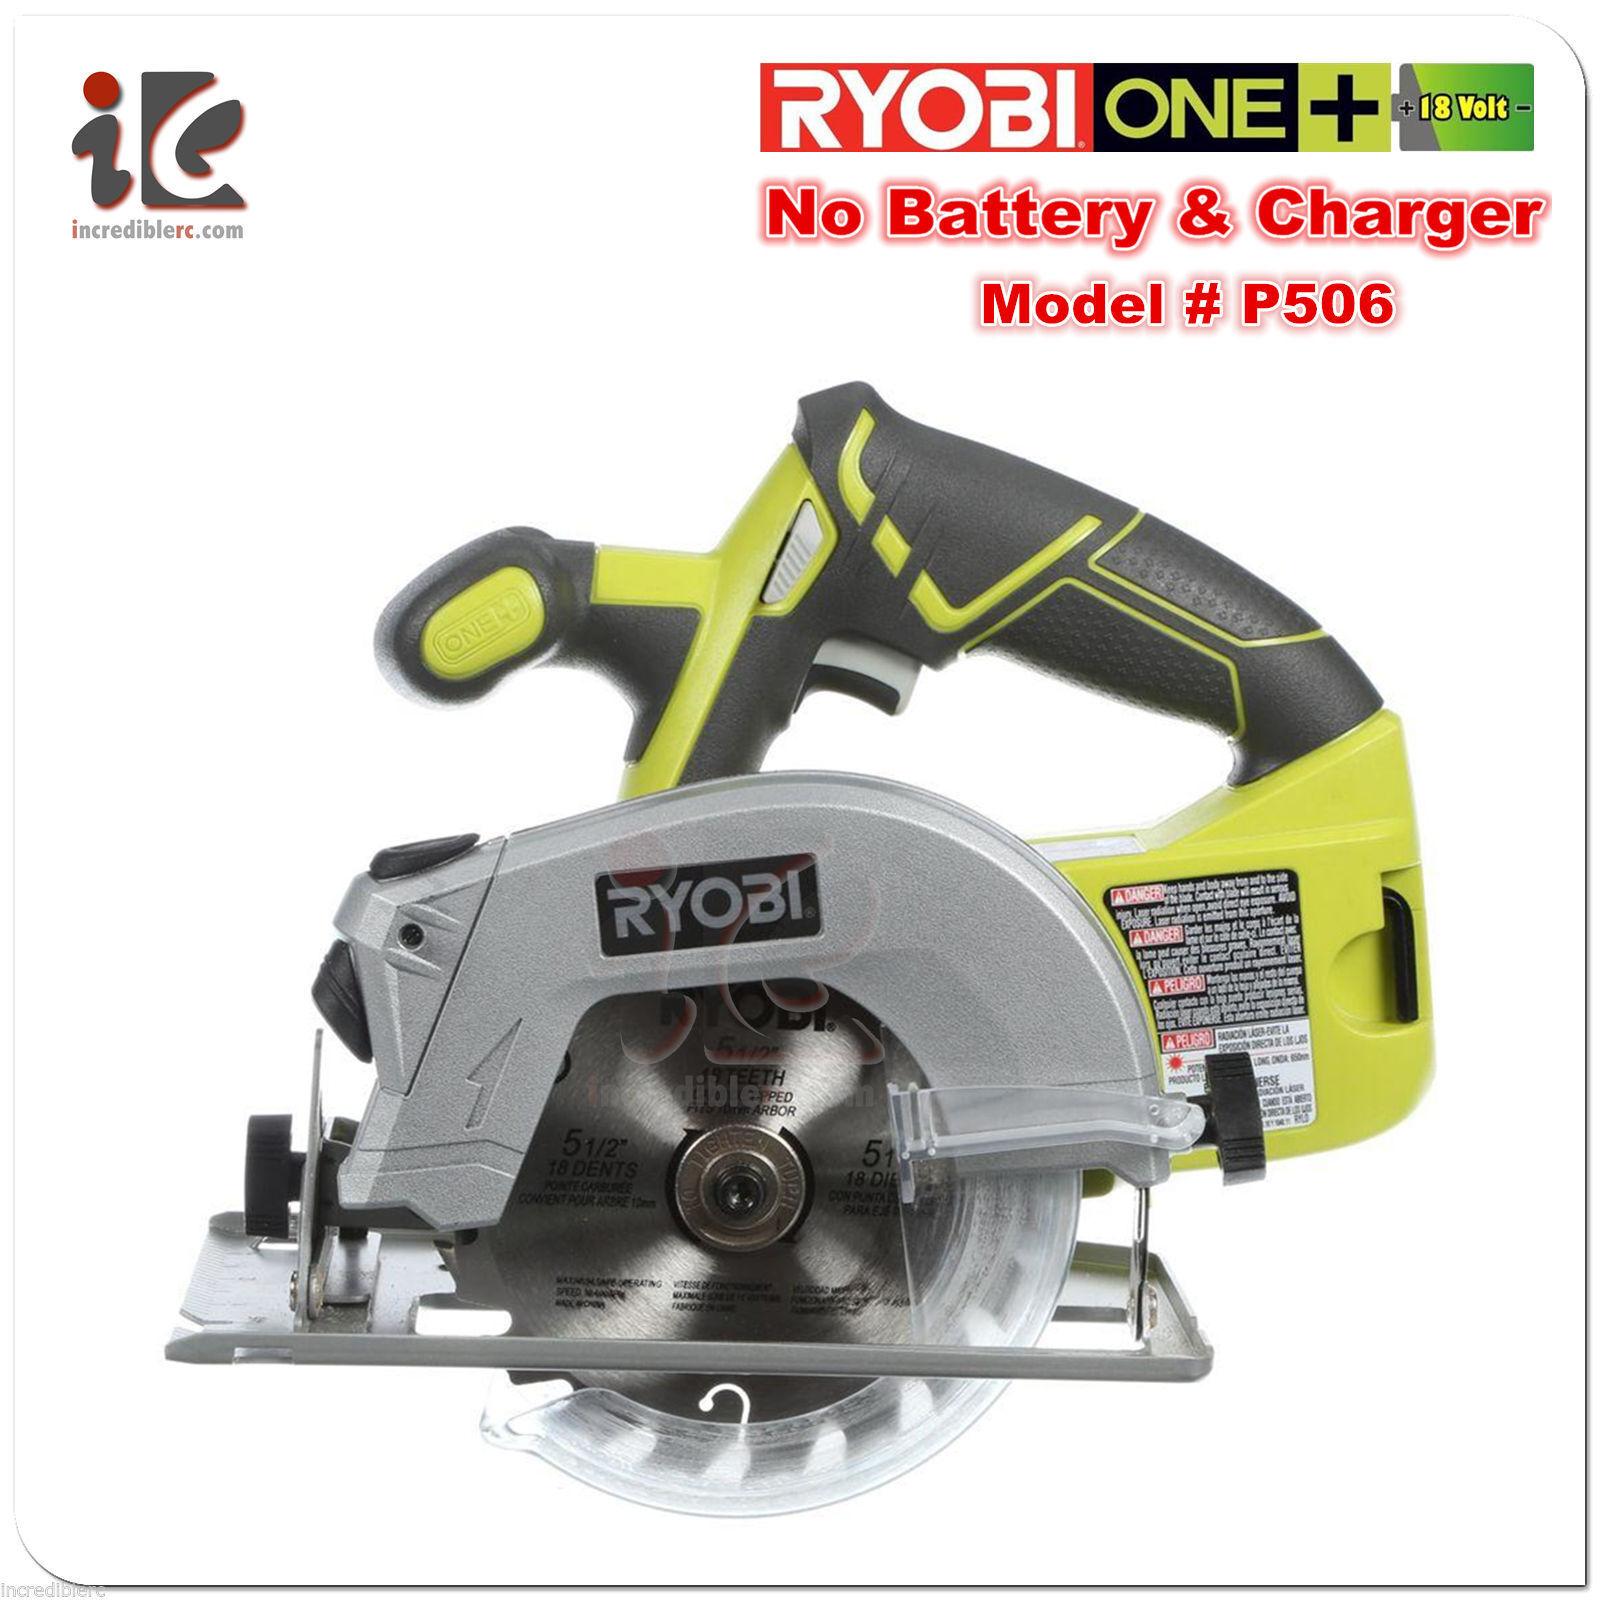 Ryobi p506 circular saw laser 18 volt cordless one bare tool ebay resntentobalflowflowcomponenttechnicalissues greentooth Gallery